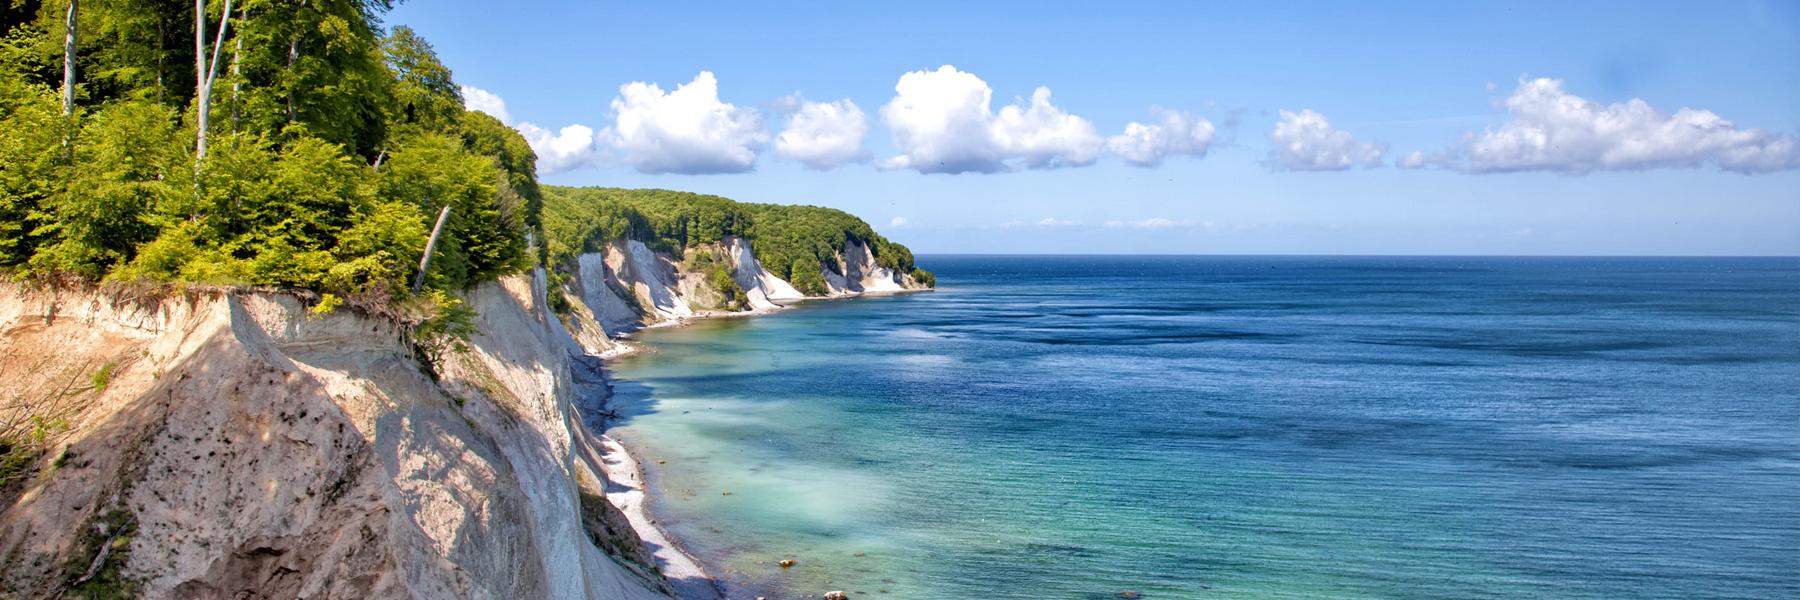 Kreideküste - Halbinsel Jasmund